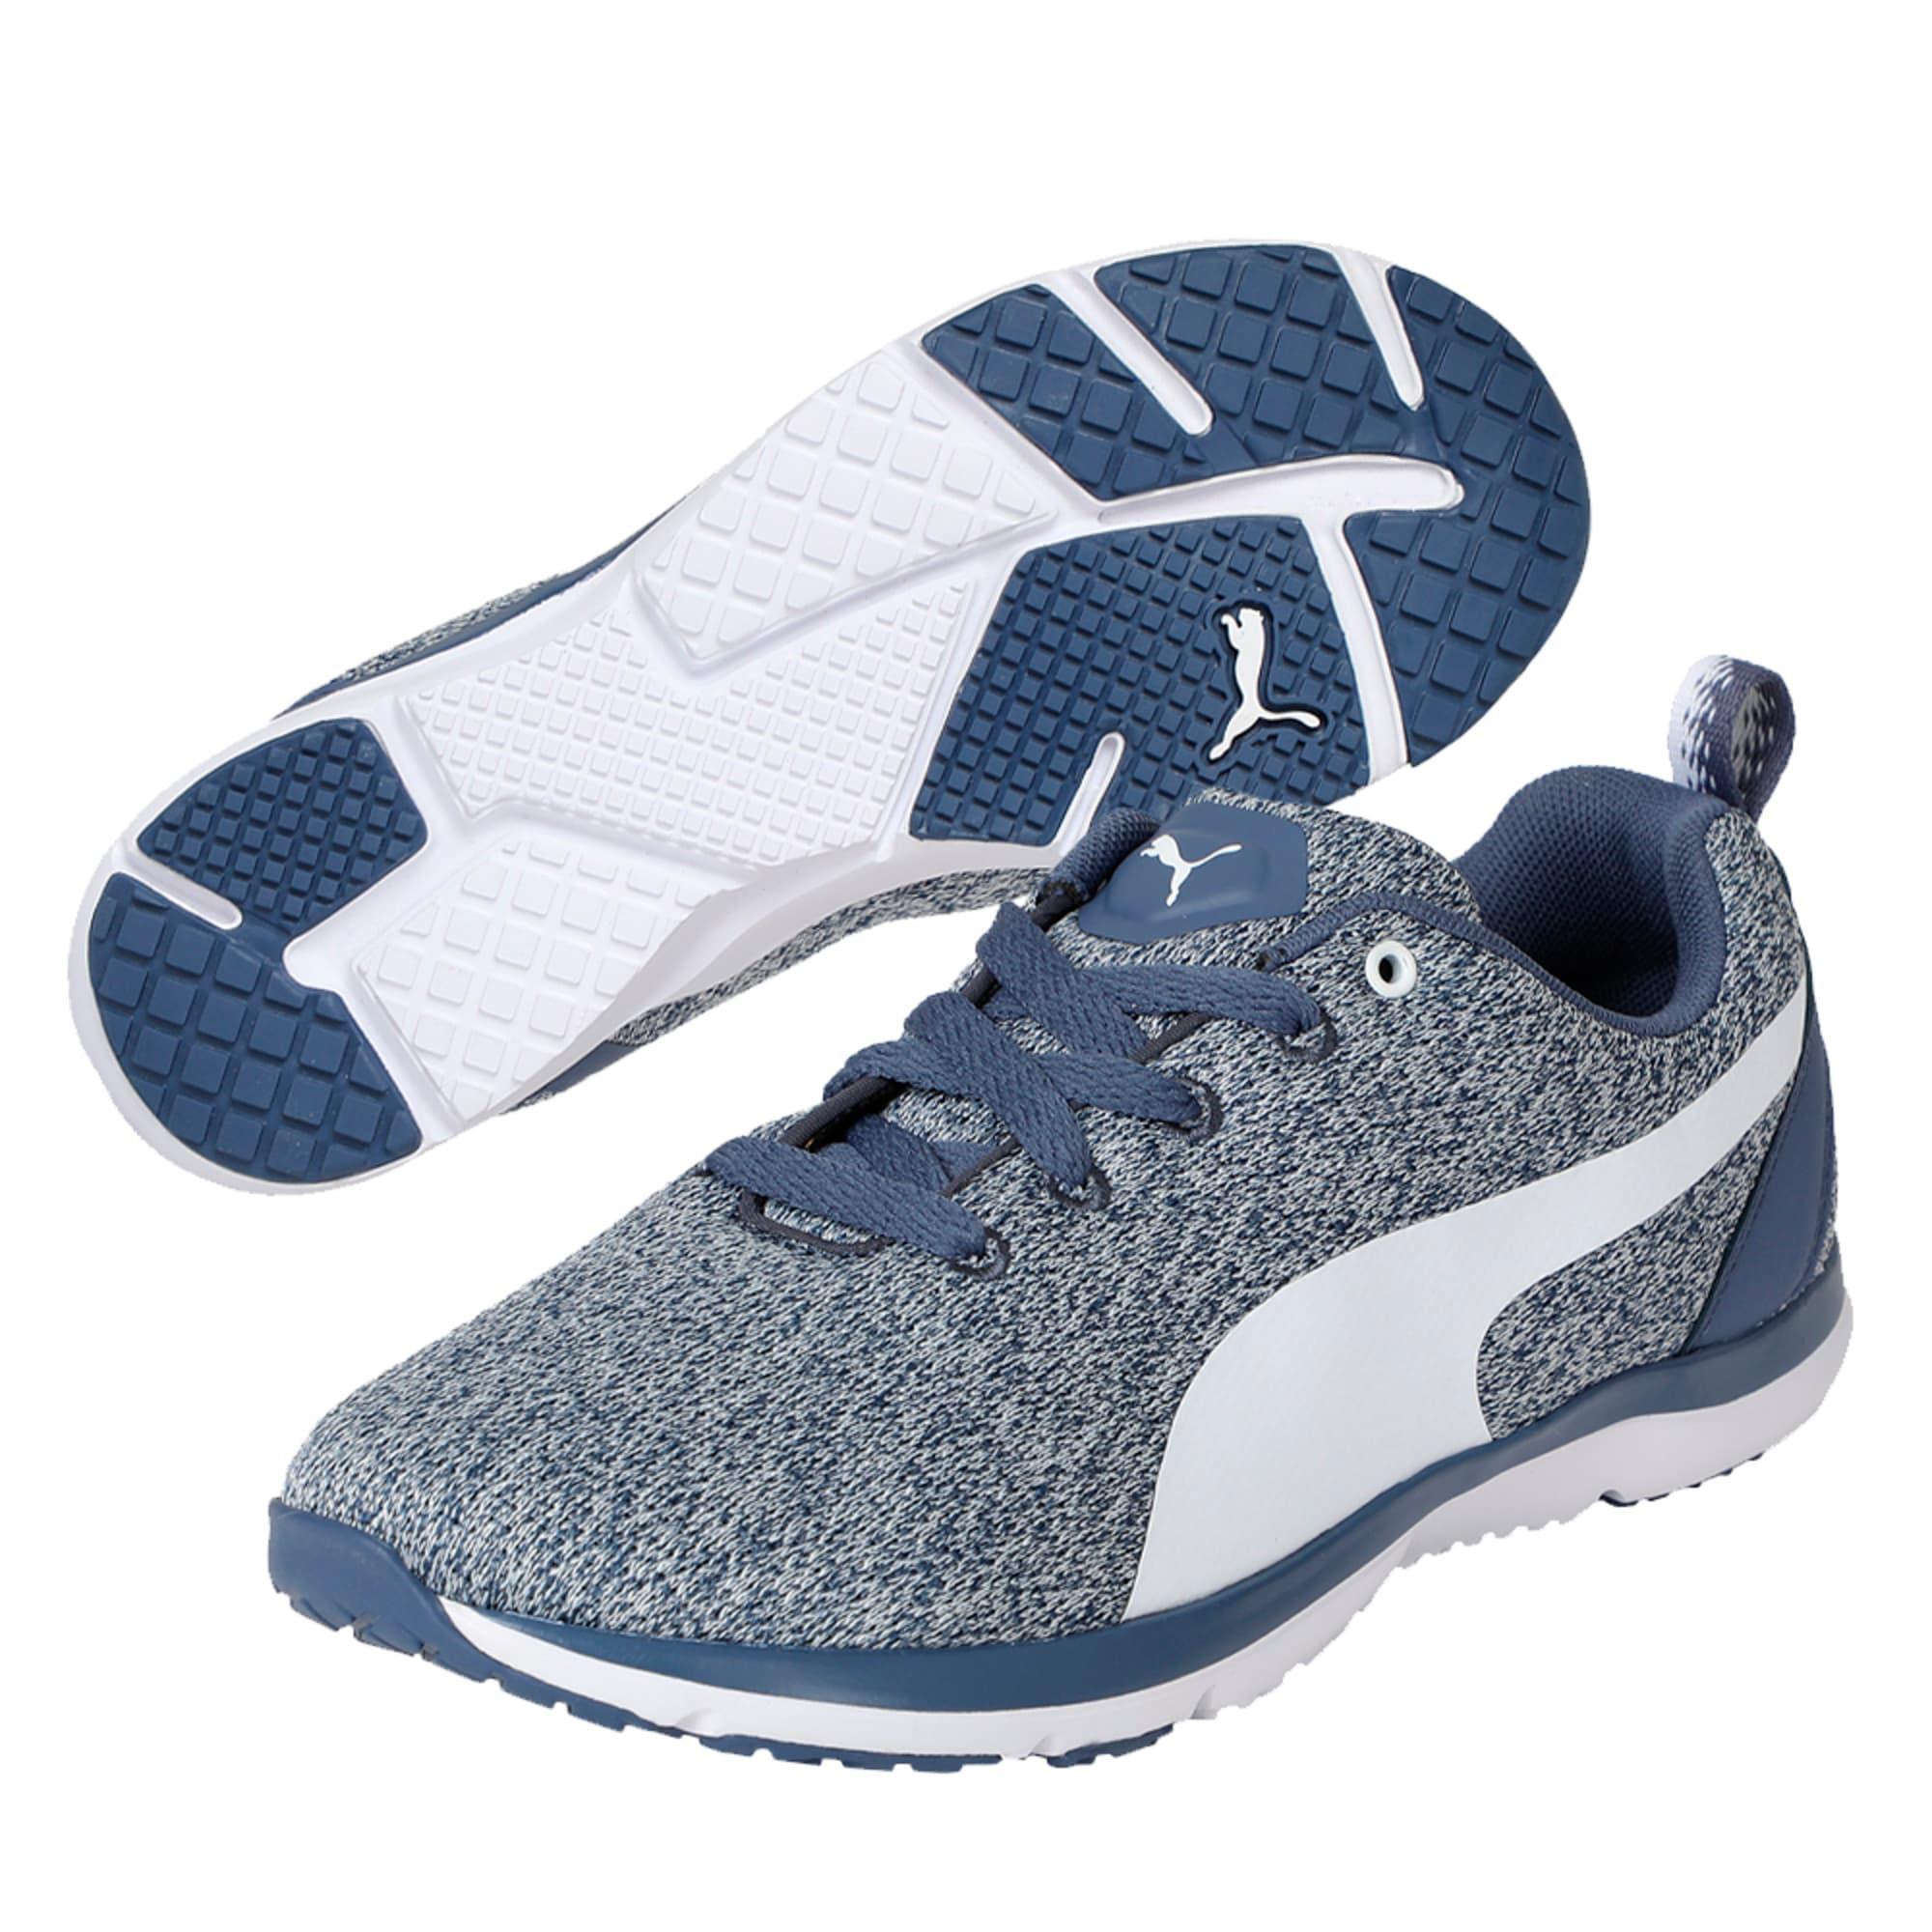 Thumbnail 2 of Flex XT Knit Women's Training Shoes, Blue Indigo-Puma White, medium-IND